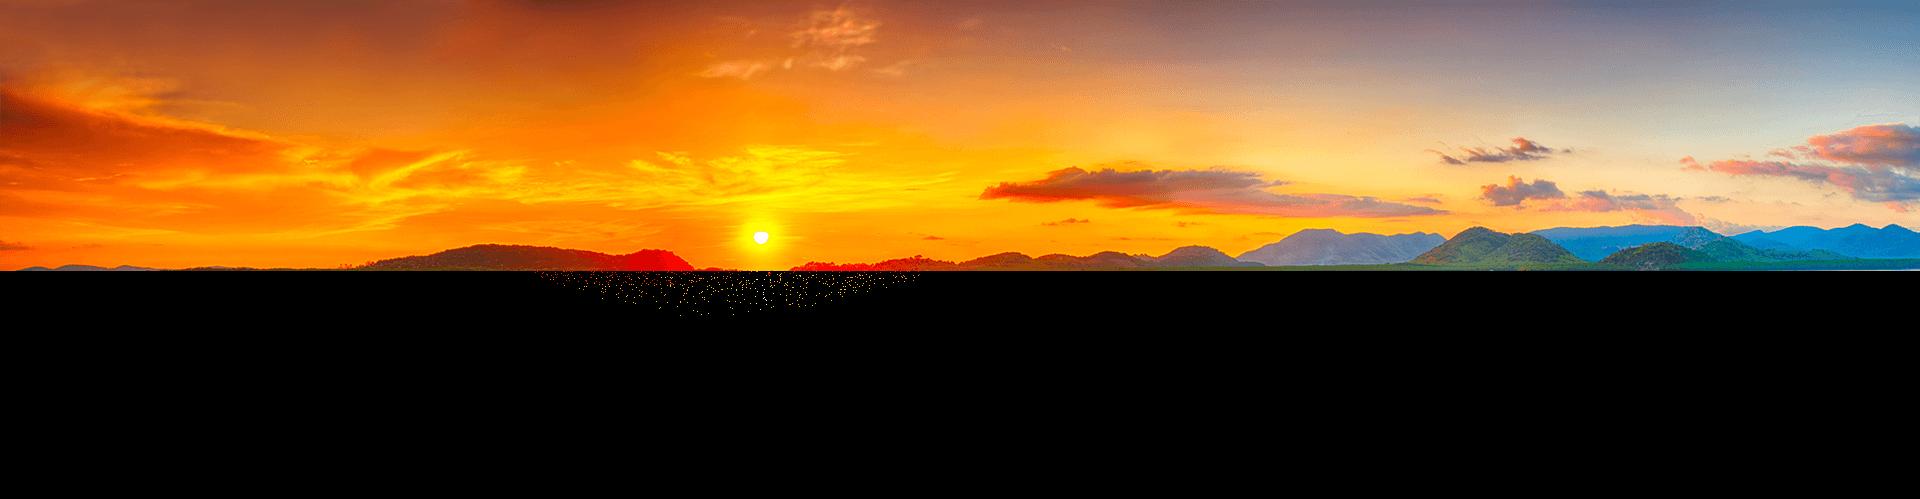 Sunrise Ford Fontana | Serving L.A., Riverside and San Bernardino ...